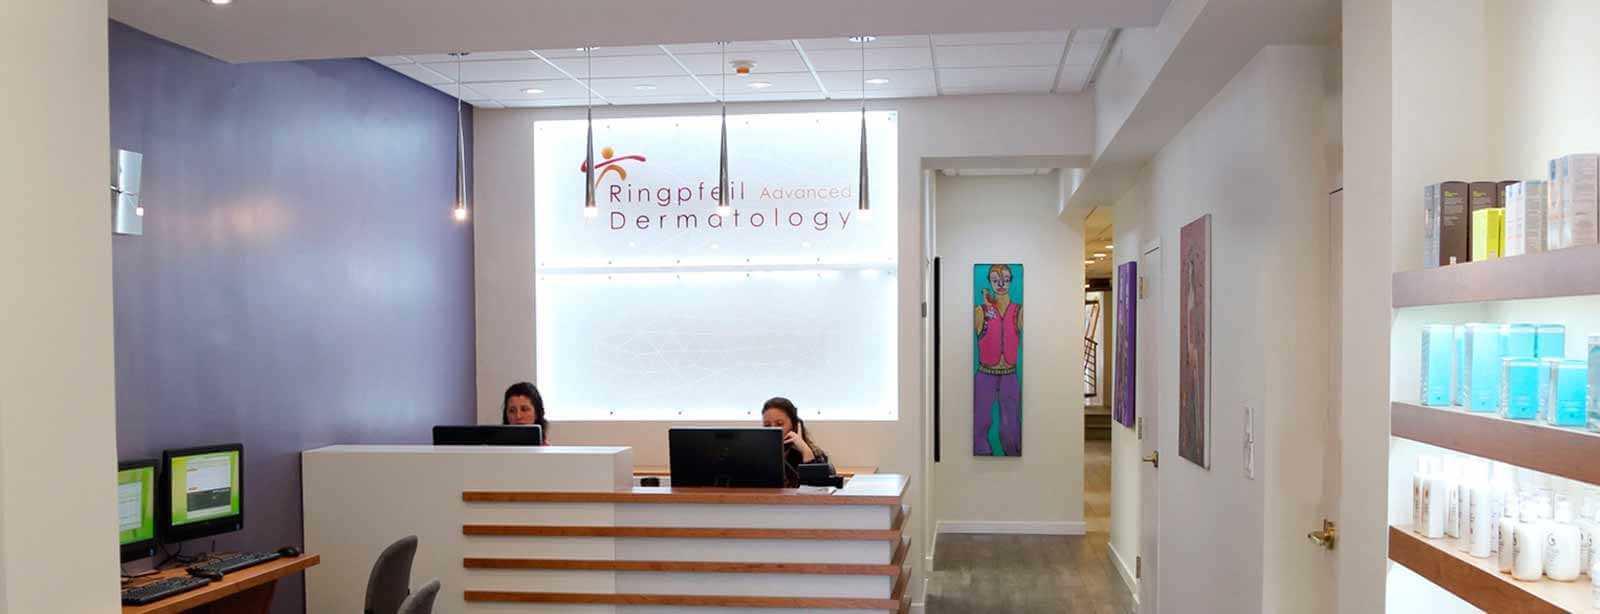 Best dermatologist in philadelphia top dermatology center pa for Dermatology clinic interior design